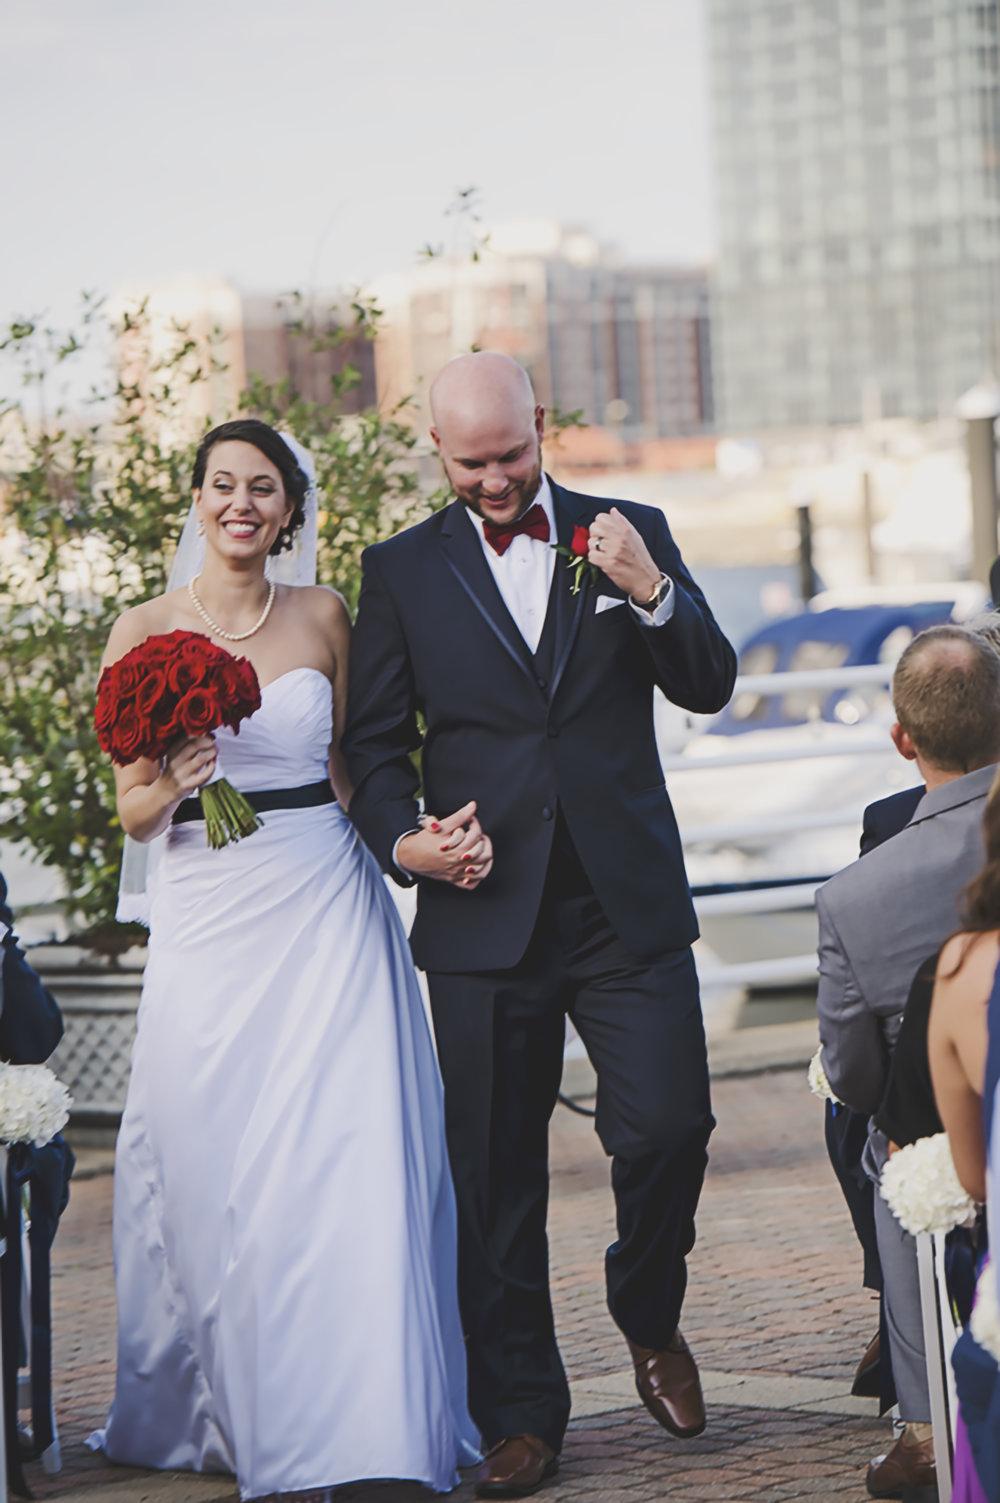 Baltimore Wedding_Summer Wedding_Navy and Red Wedding_Kelsey Lane Photography_Seattle Wedding Photographer_9